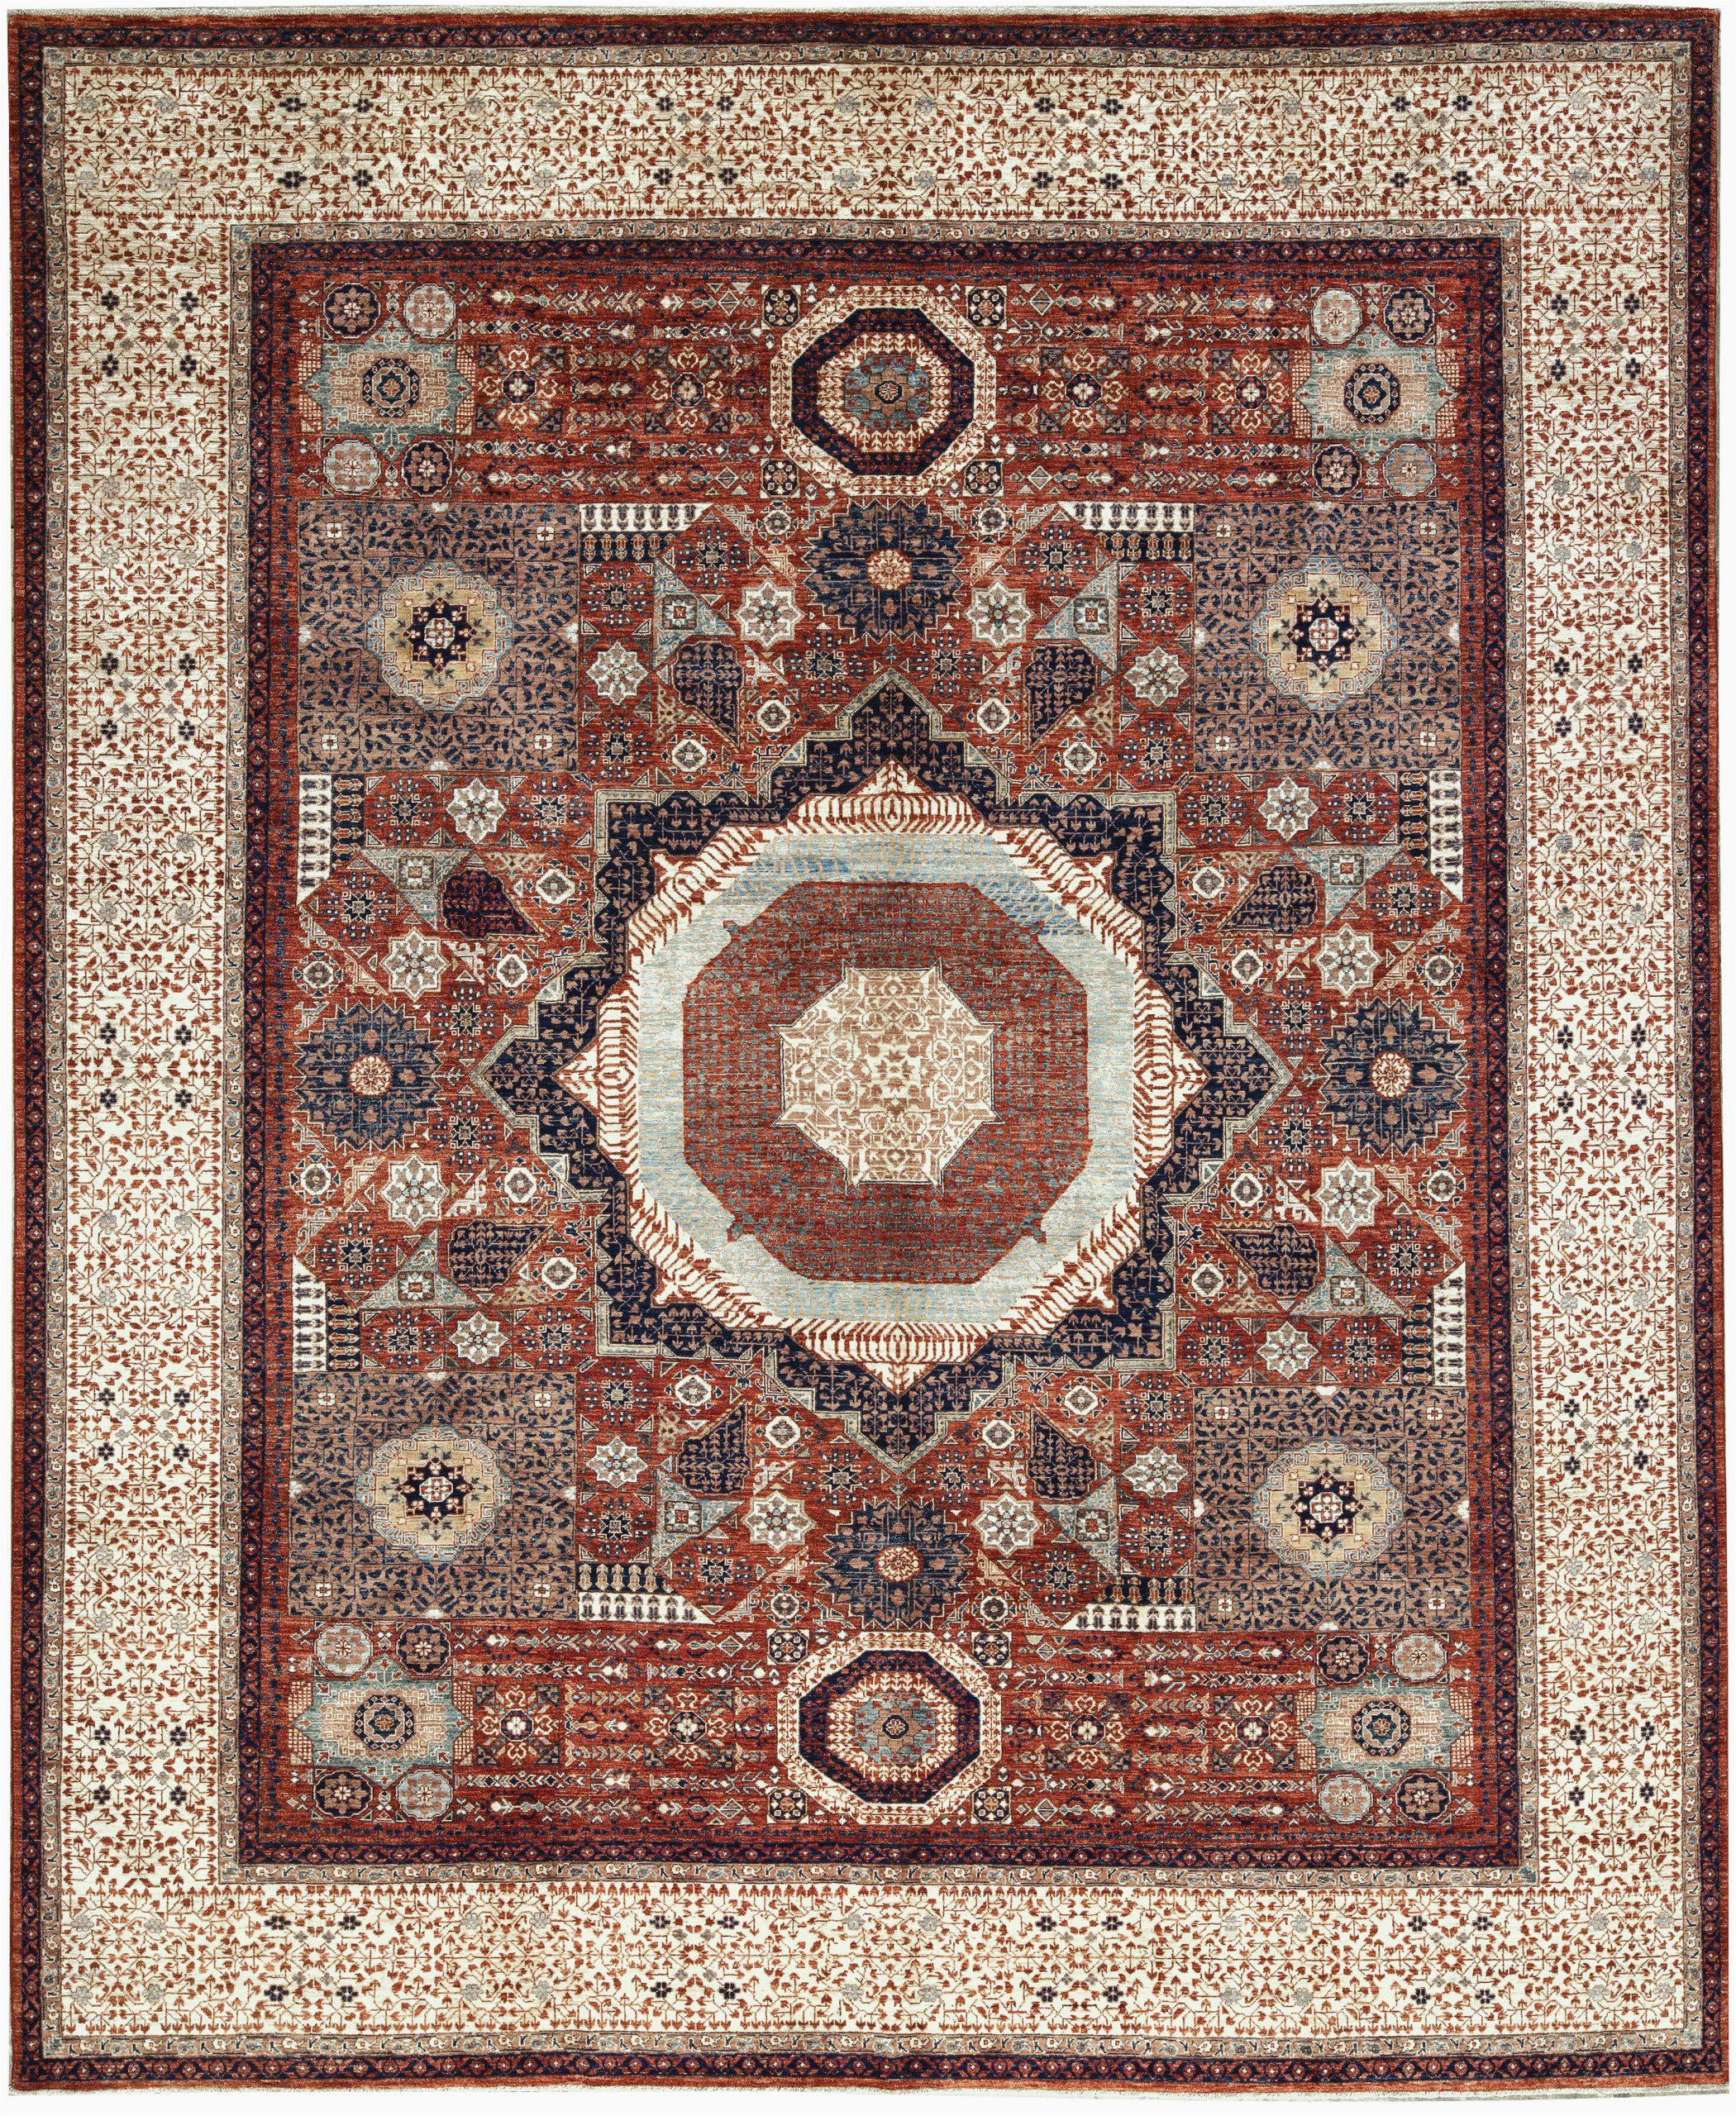 bokara rug co inc one of a kind aryana handwoven 118 x 1311 wool redivory area rug abhd2175